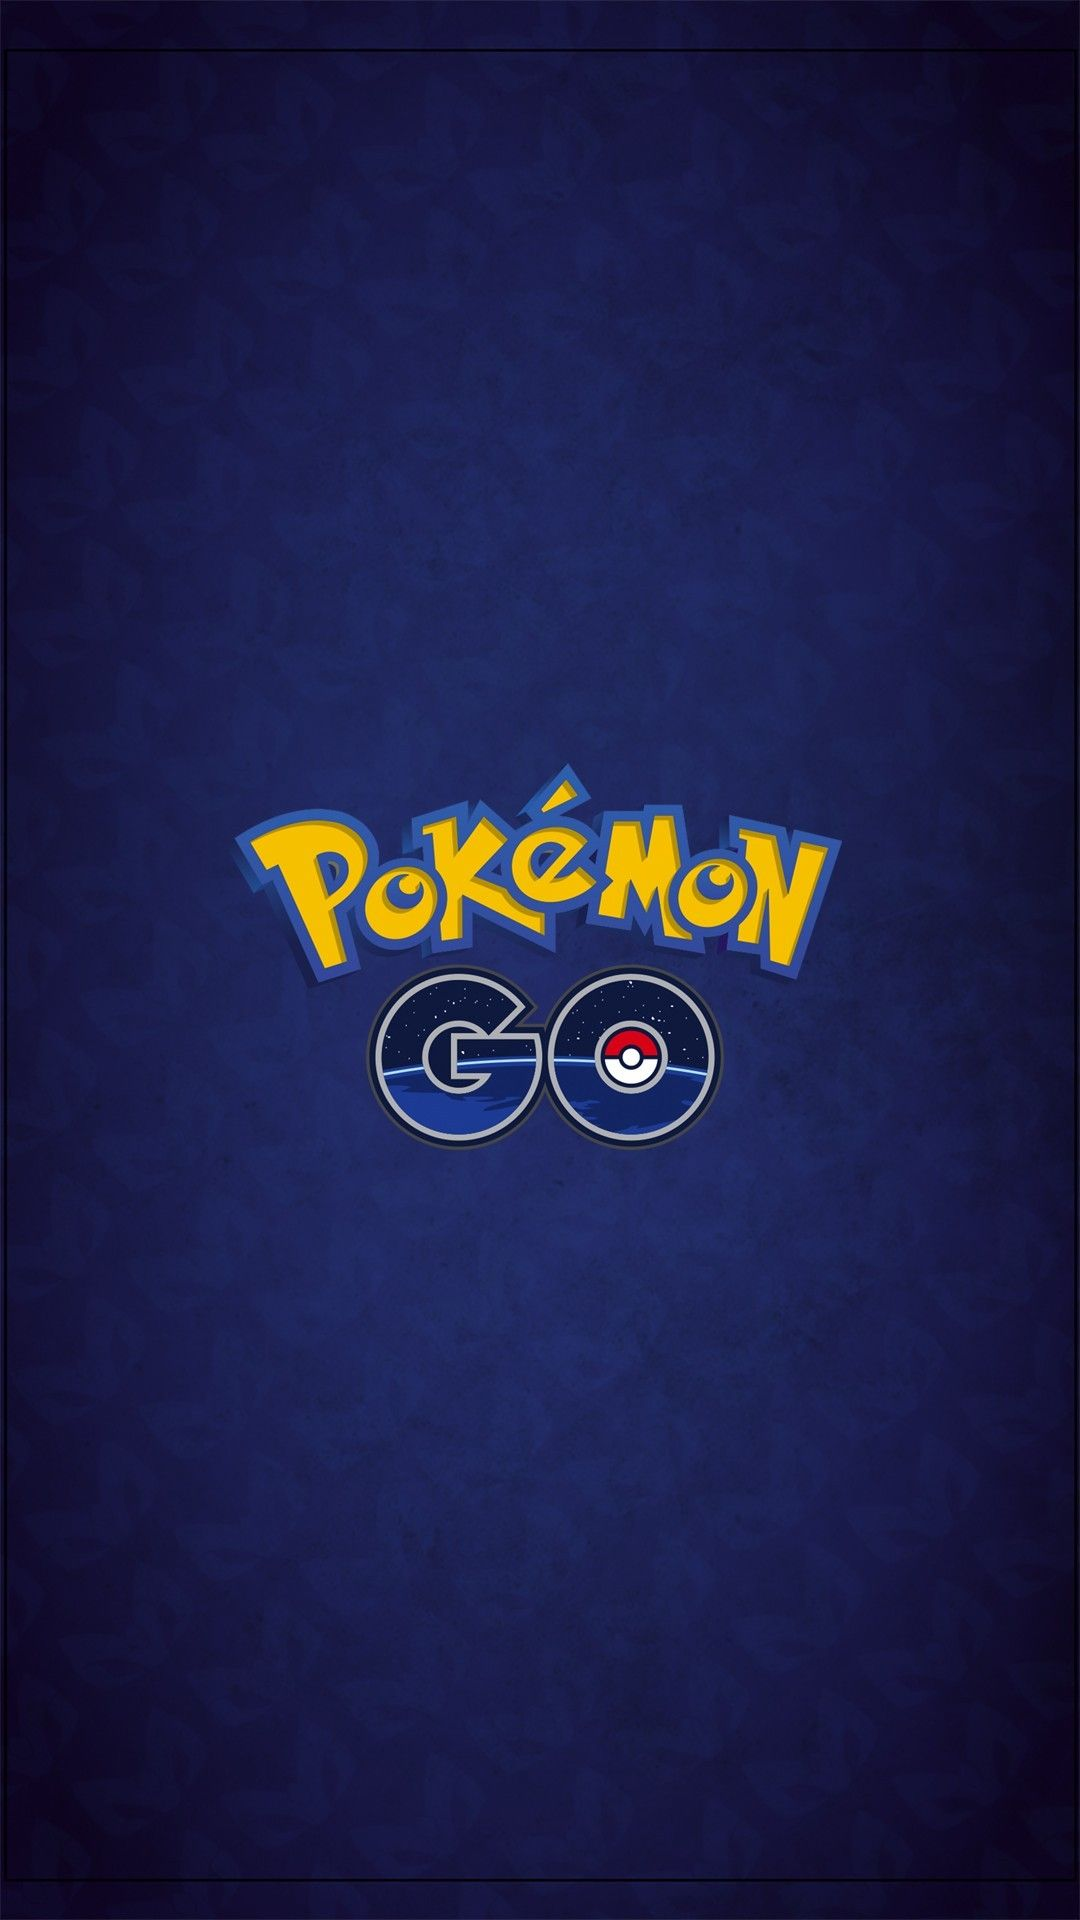 Pokemon Cool iOS 10 wallpaper